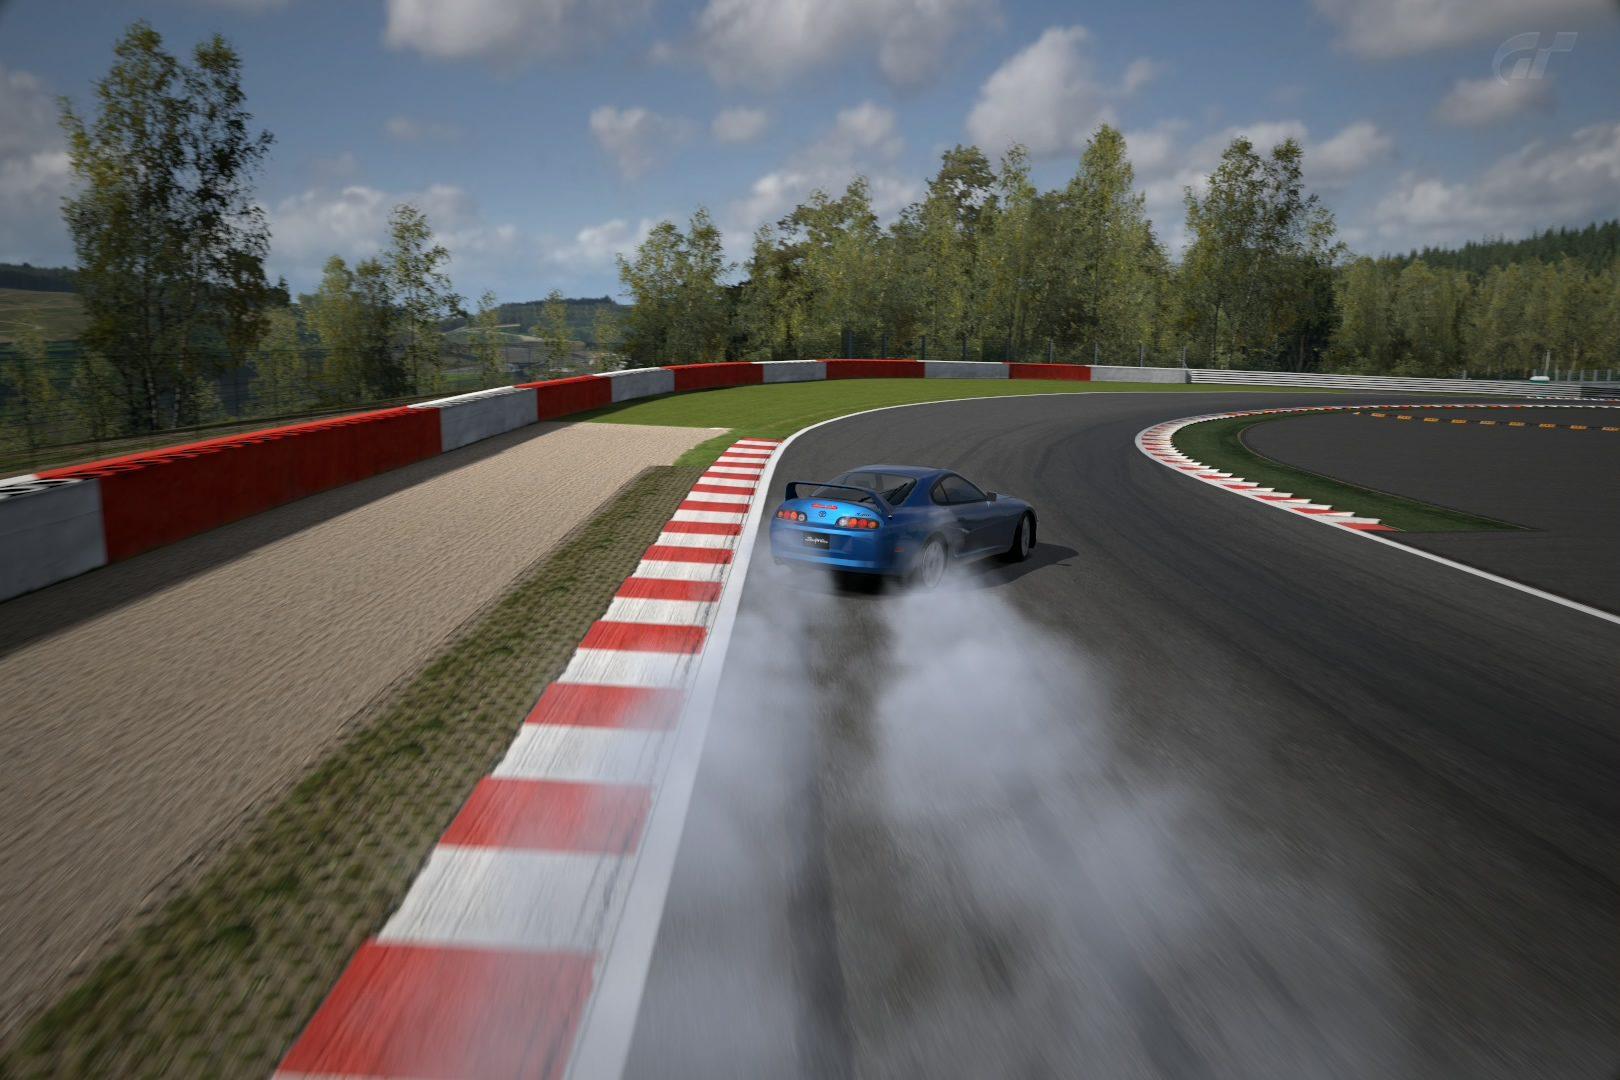 Circuit de Spa-Francorchamps_3.jpg